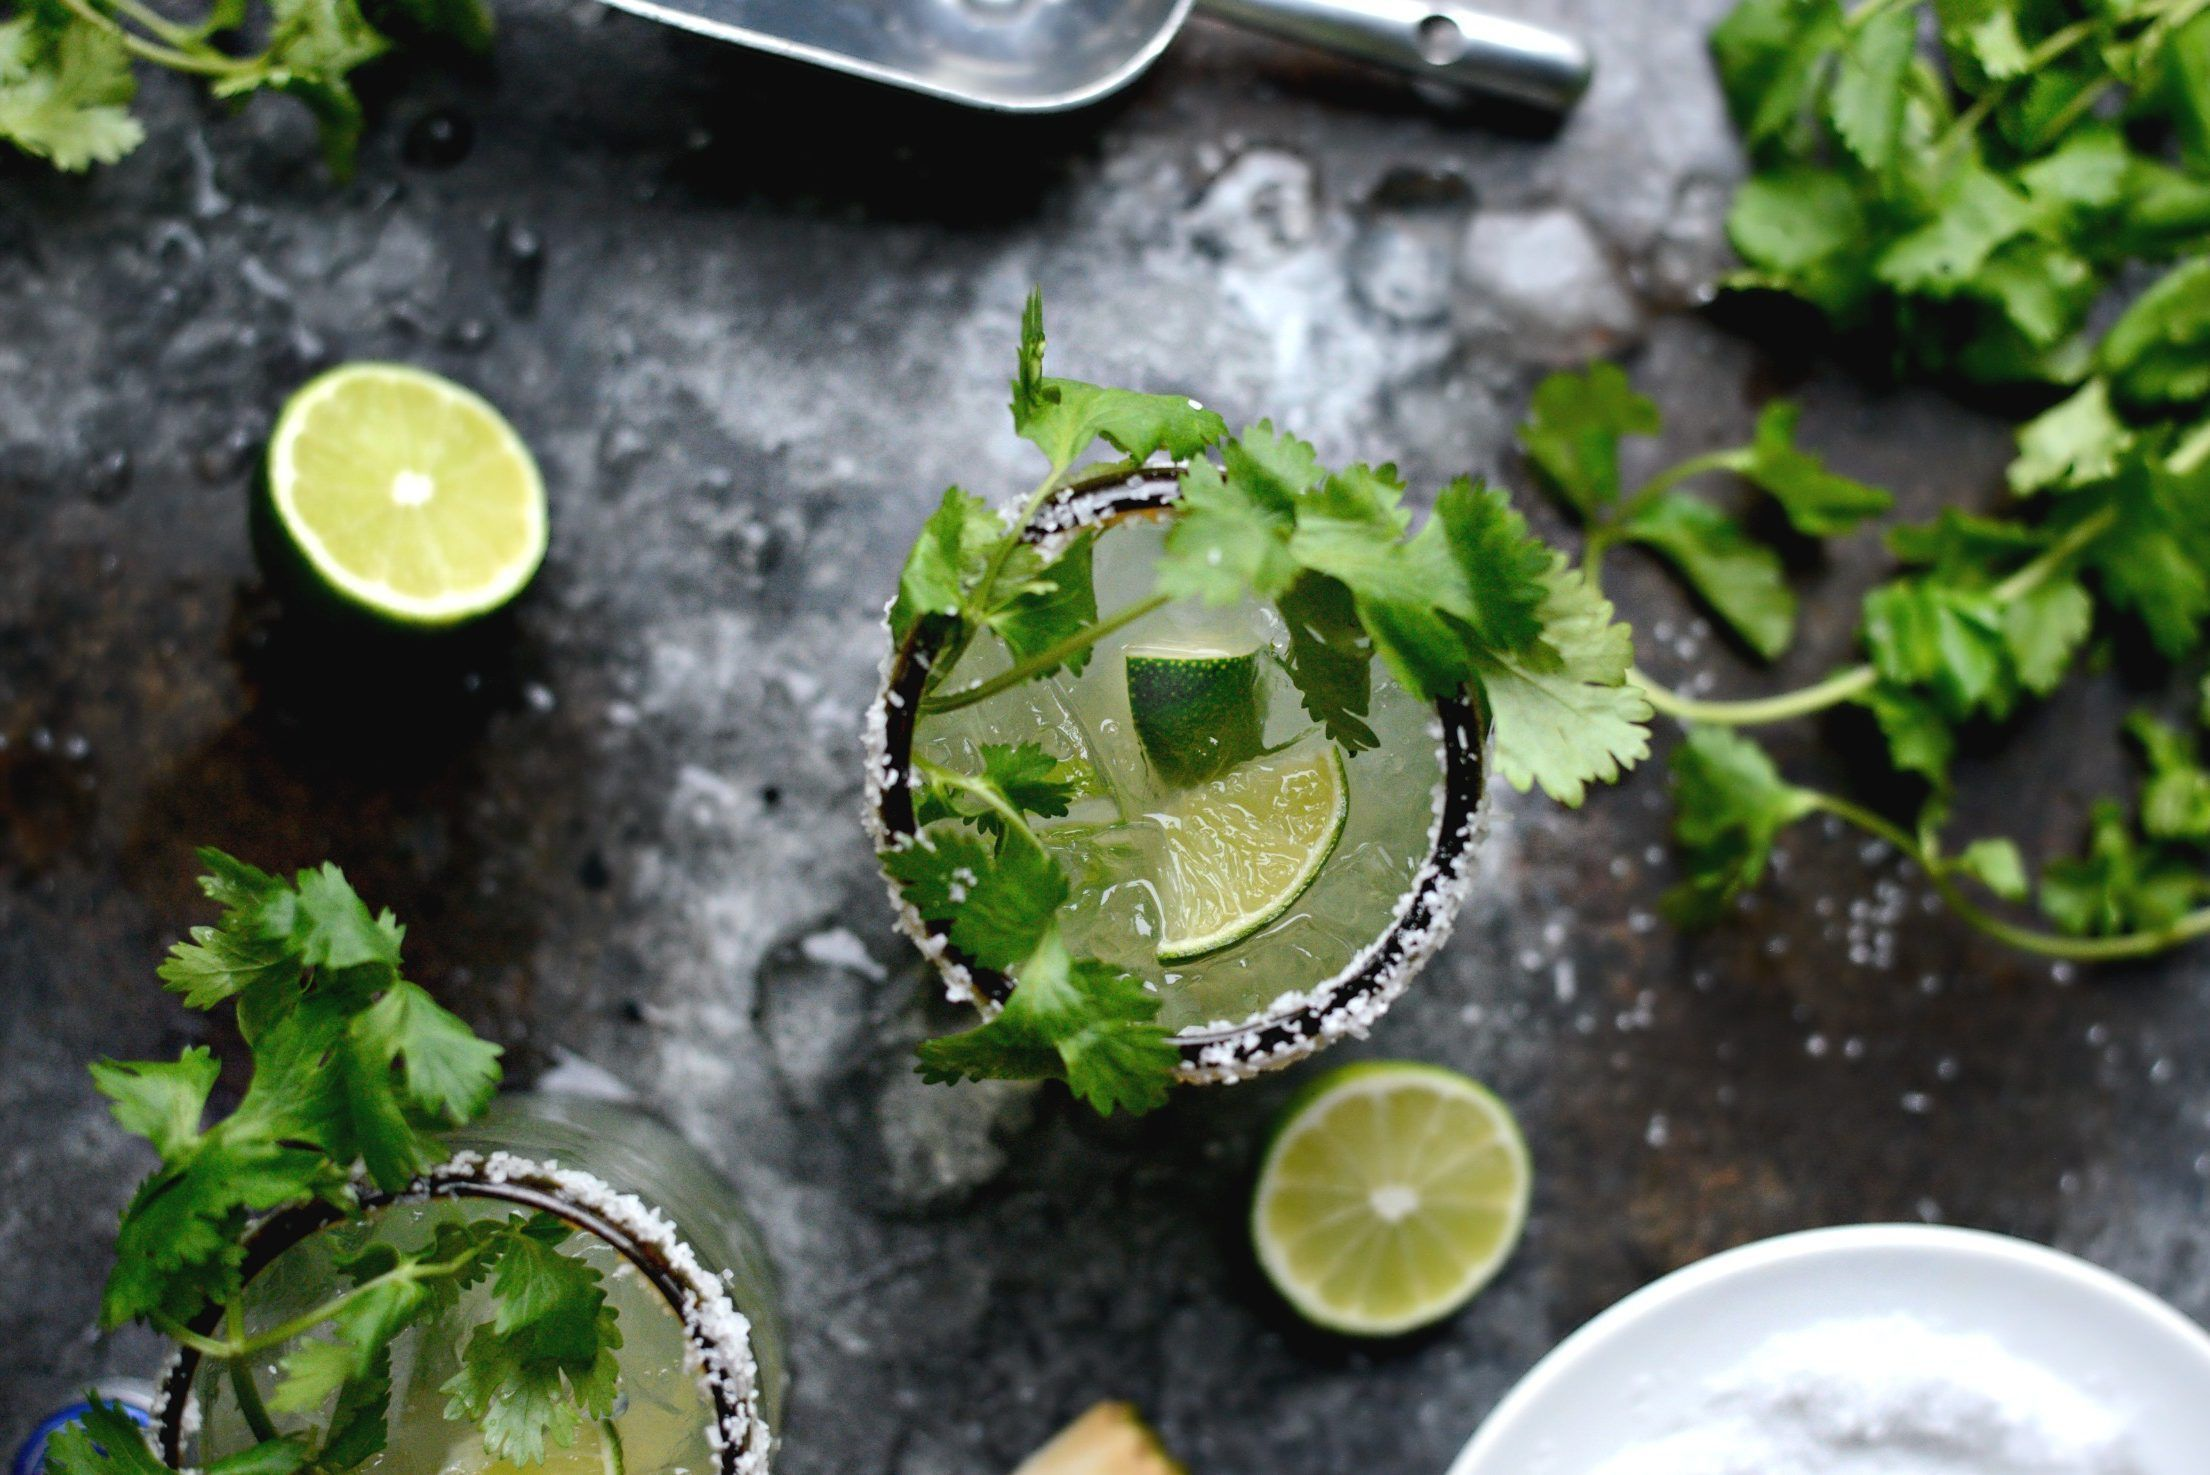 Cilantro Lime Margaritas #limemargarita Cilantro Lime Margaritas #limemargarita Cilantro Lime Margaritas #limemargarita Cilantro Lime Margaritas #limemargarita